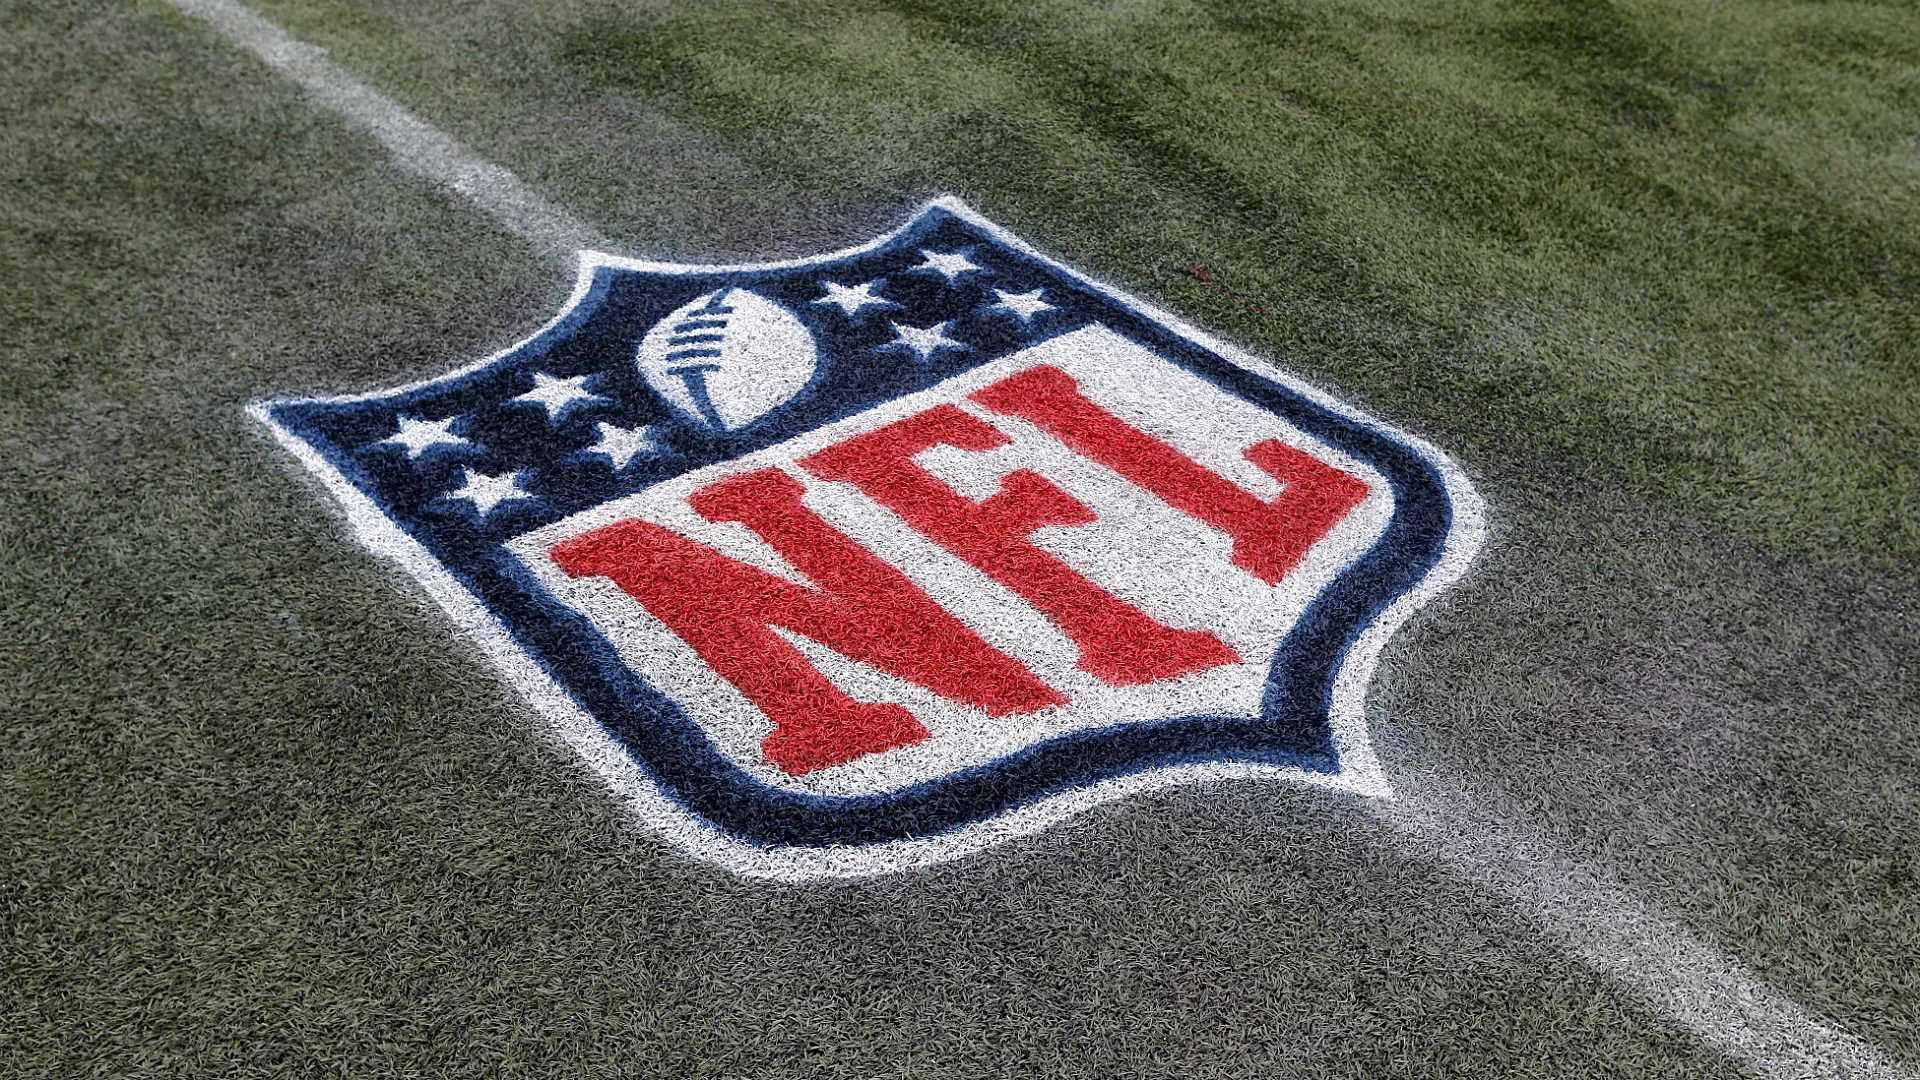 Inside The Star: Week 13 NFL Game Picks